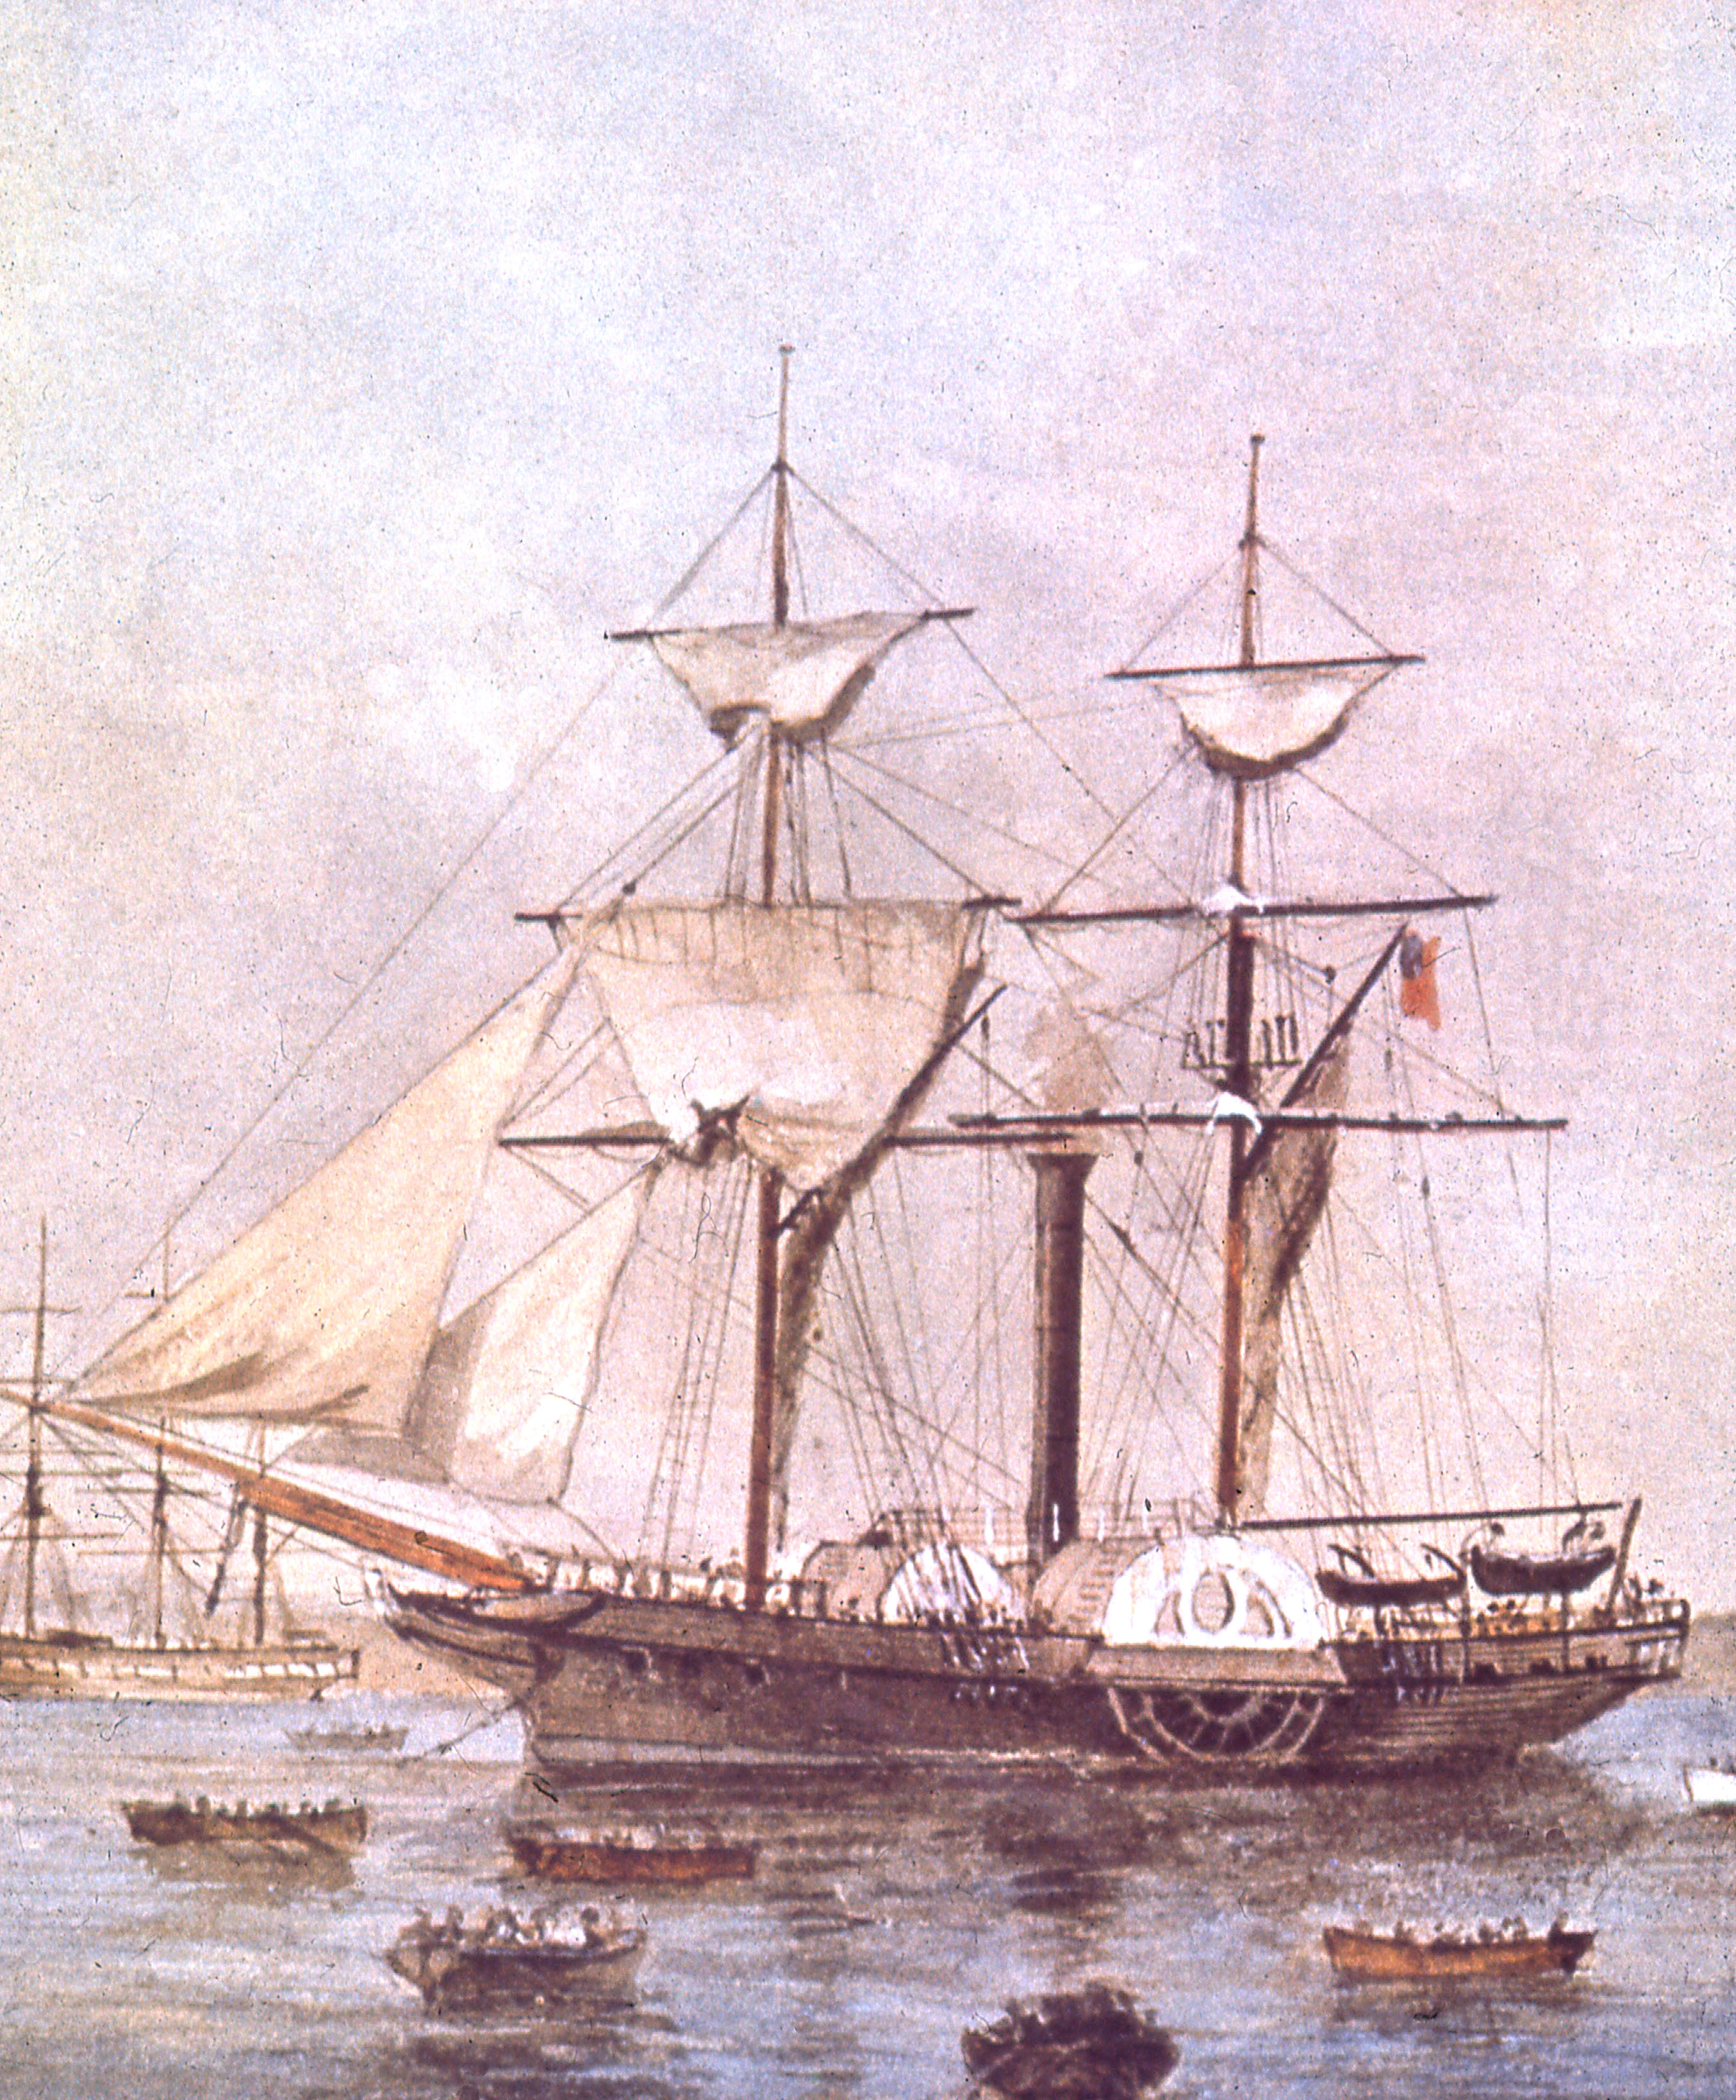 Early Steamships (1831 - 1845)